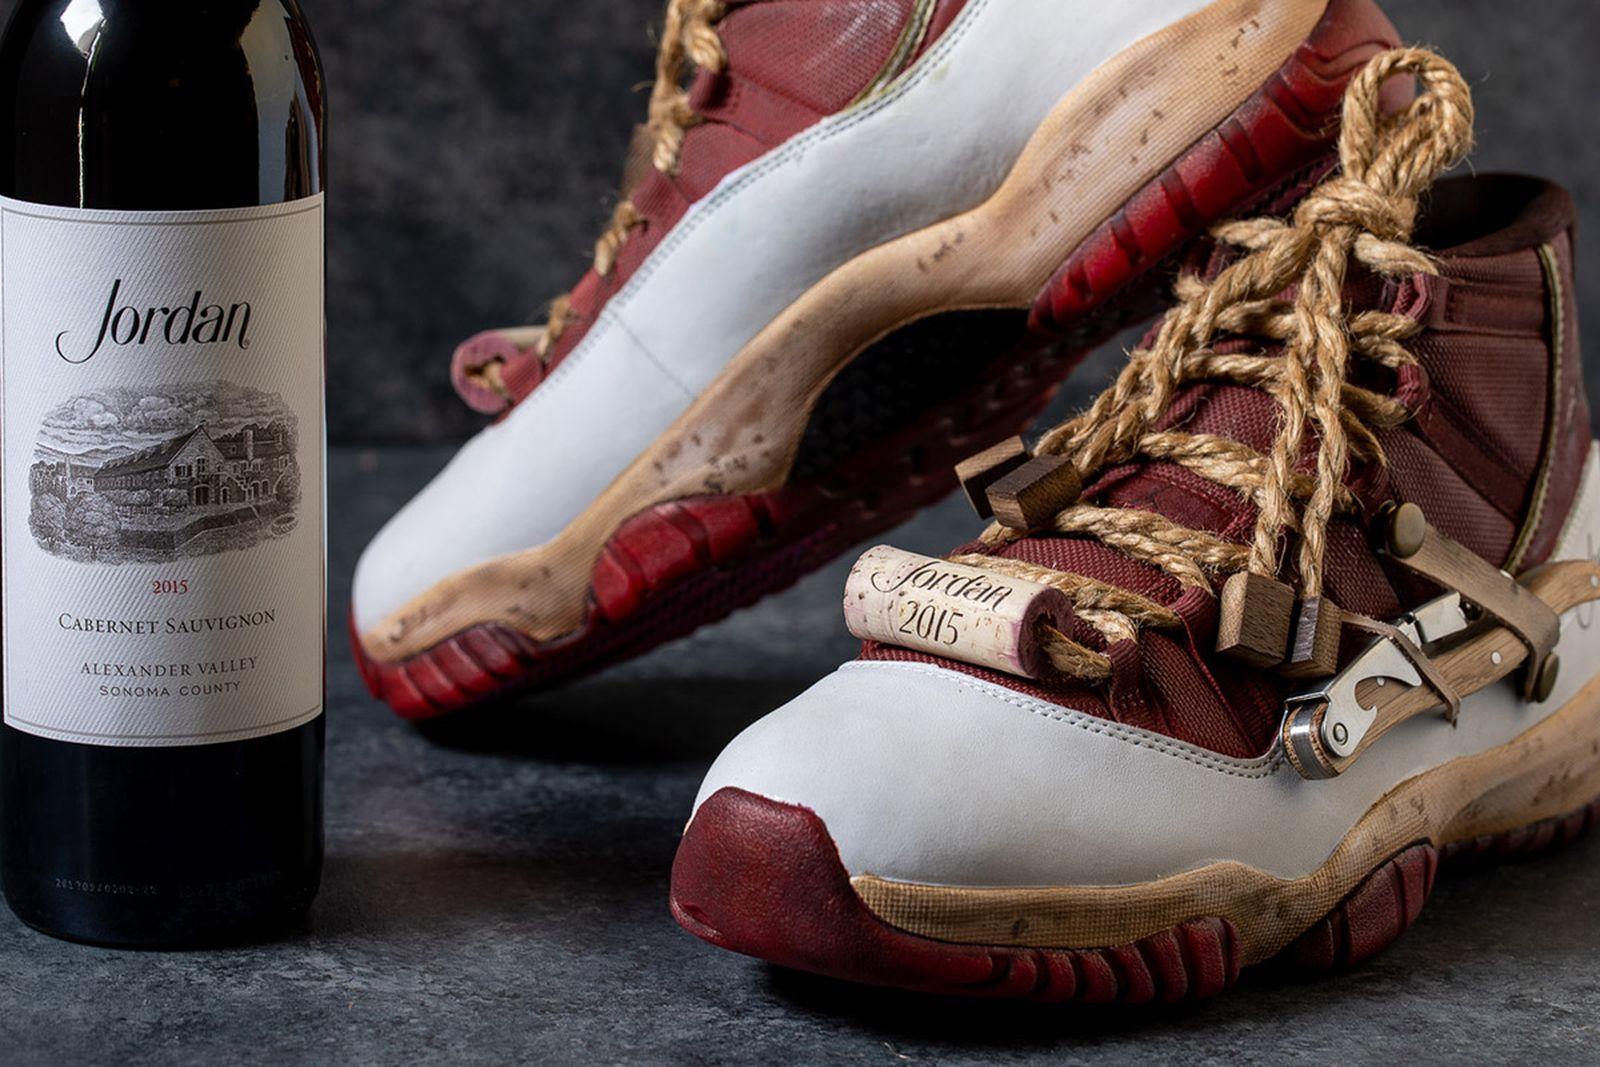 nike air jordan 10 cabernet sauvignon april fools April Fool's Jordan Winery